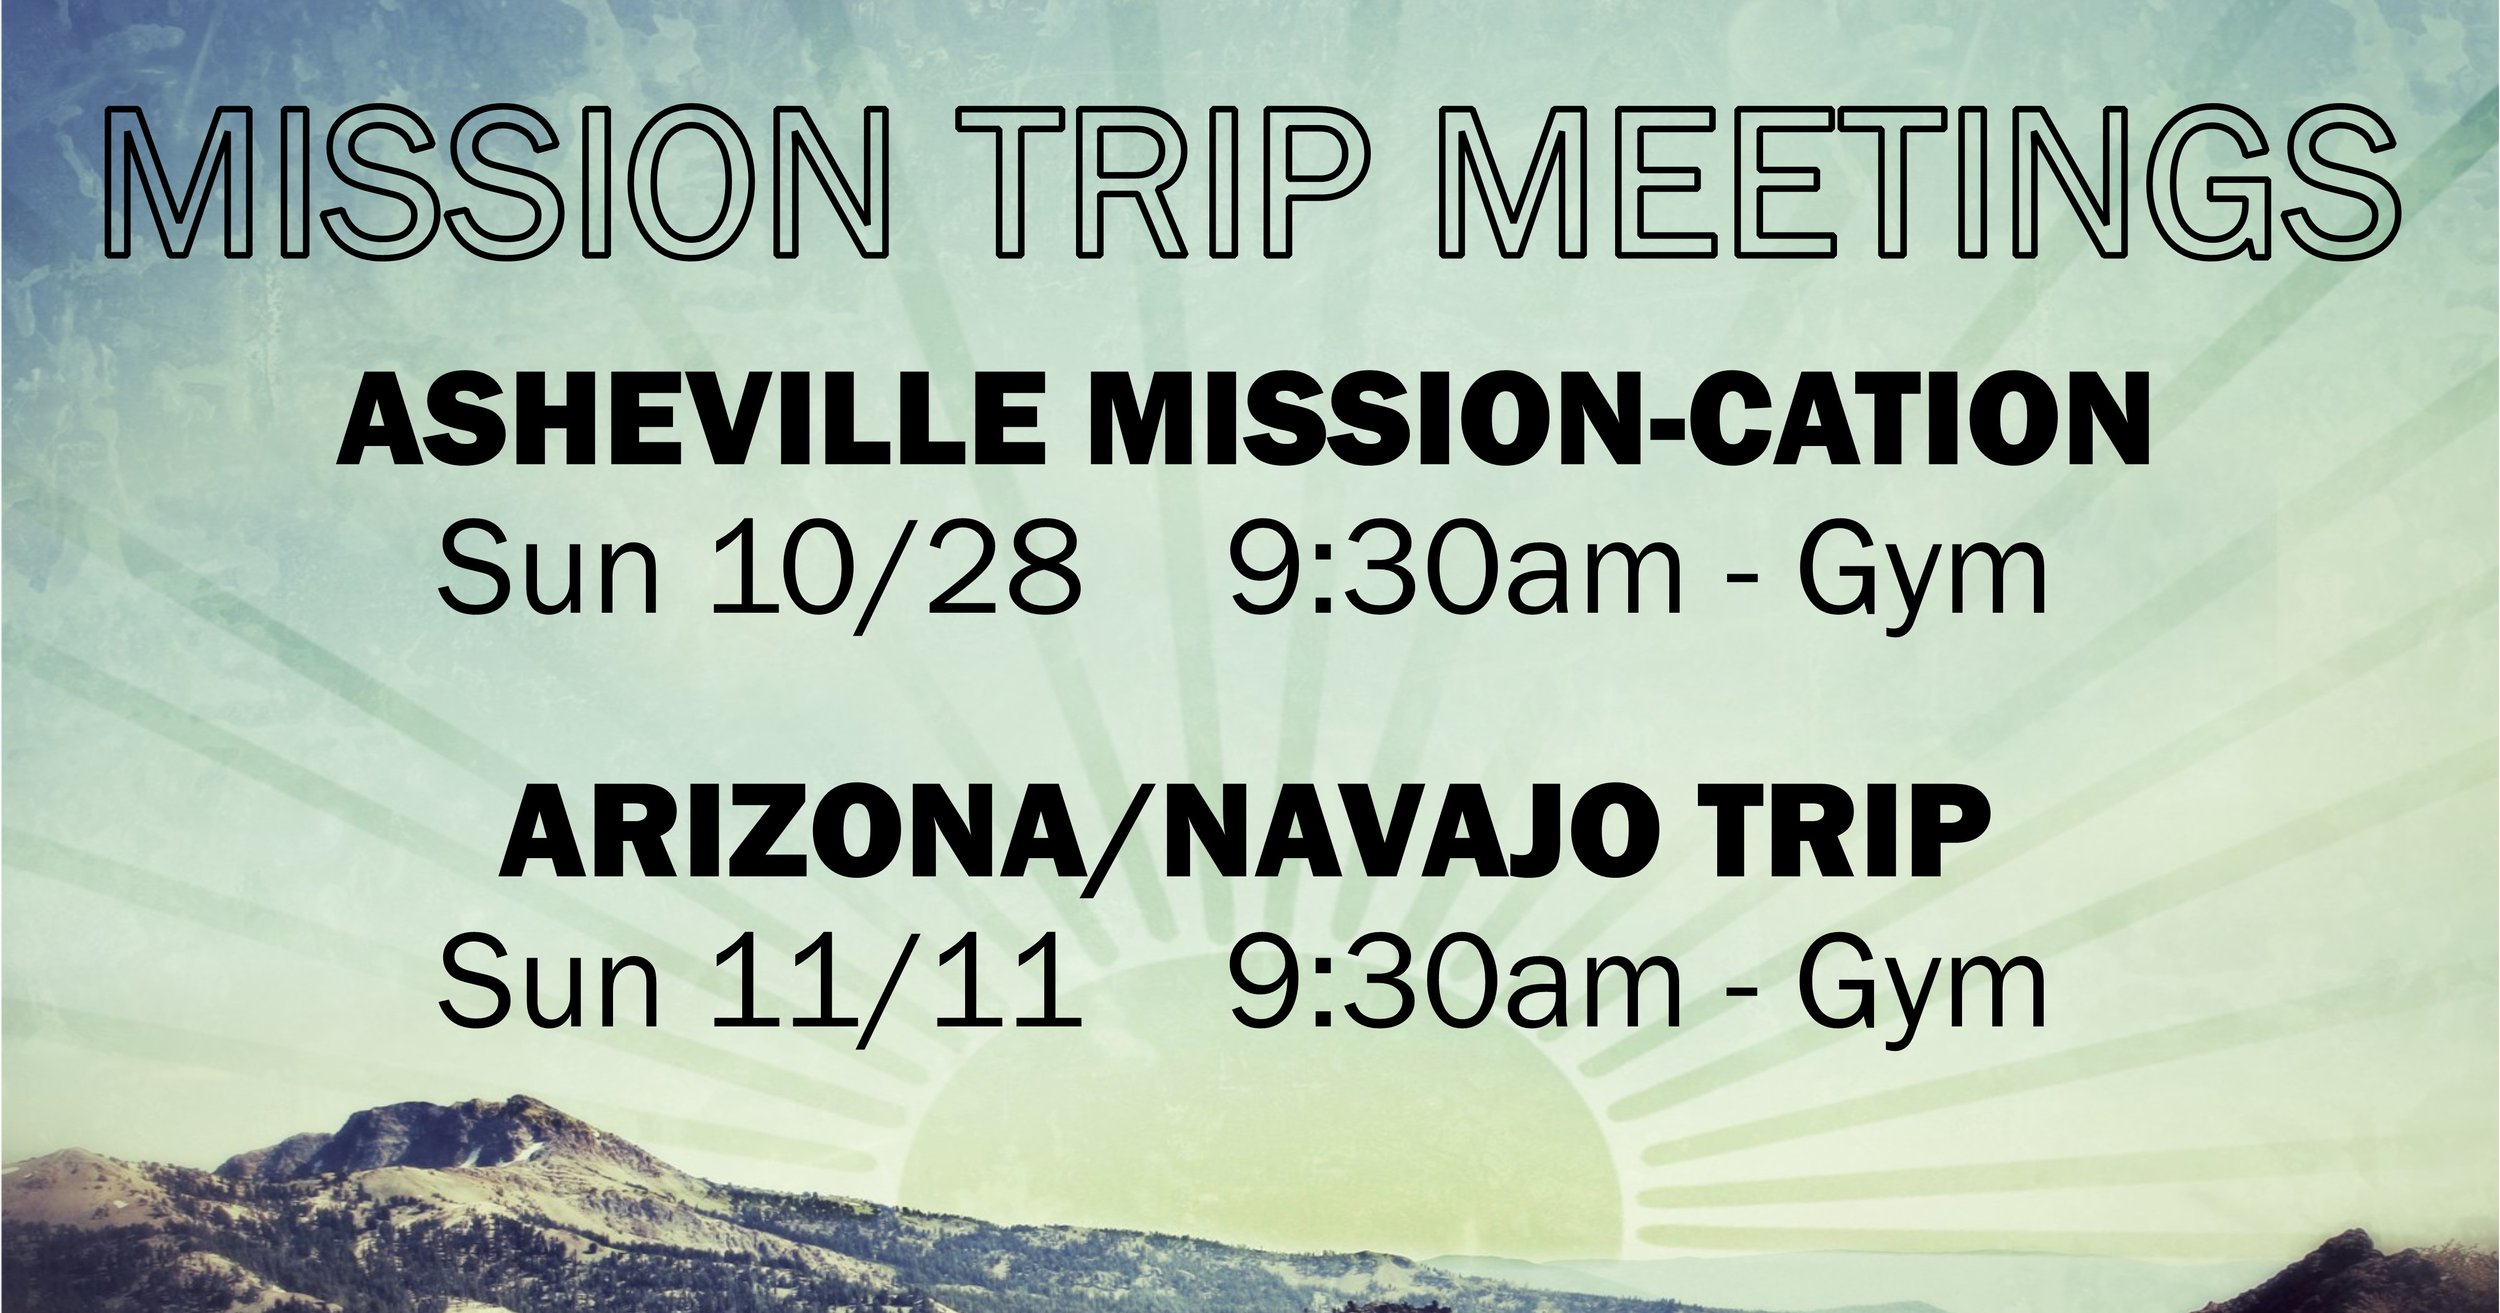 Mission Trip Mtgs facebook link 100718.jpg